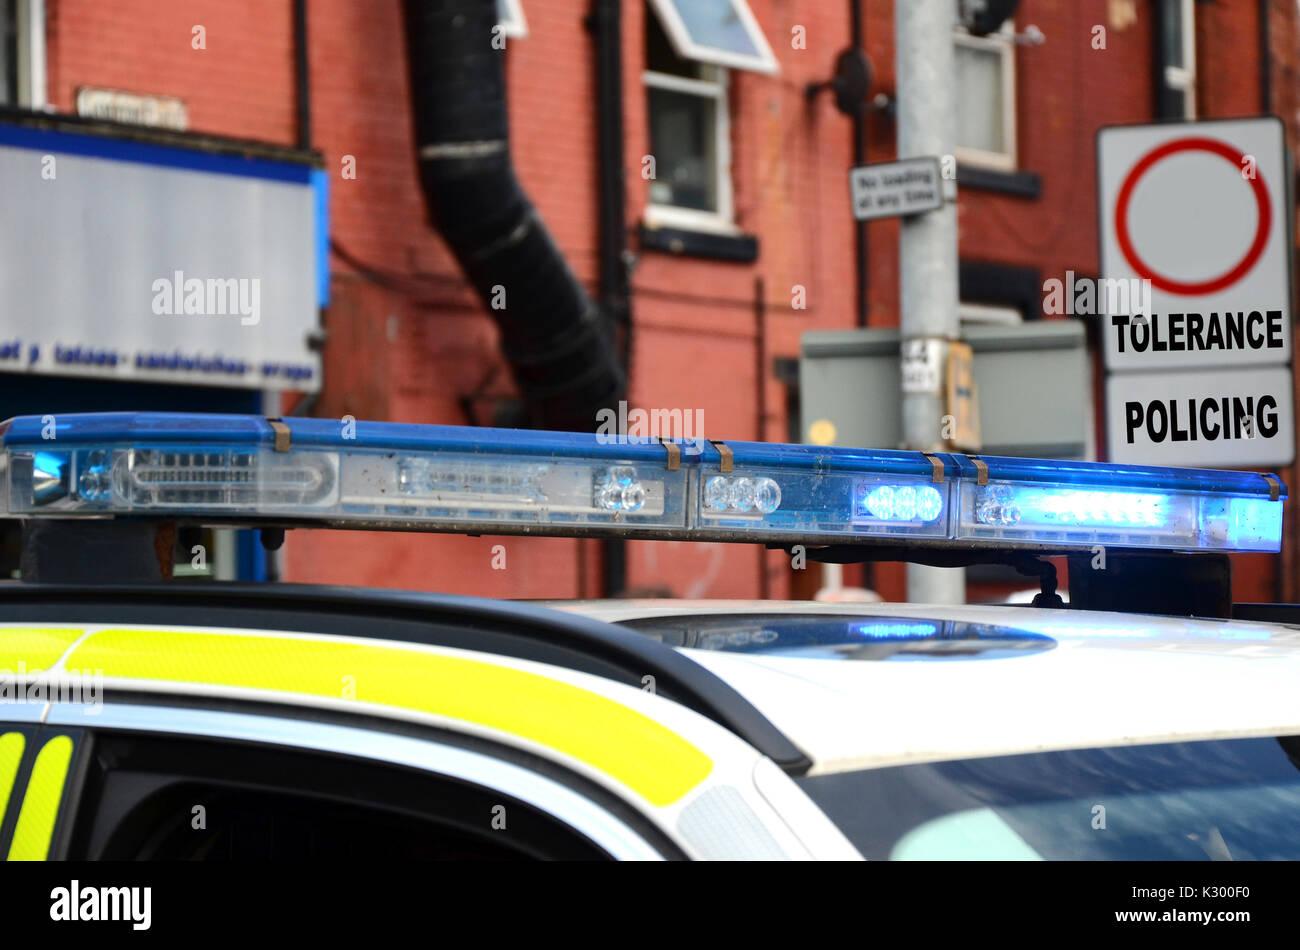 zero tolerance policing - Stock Image